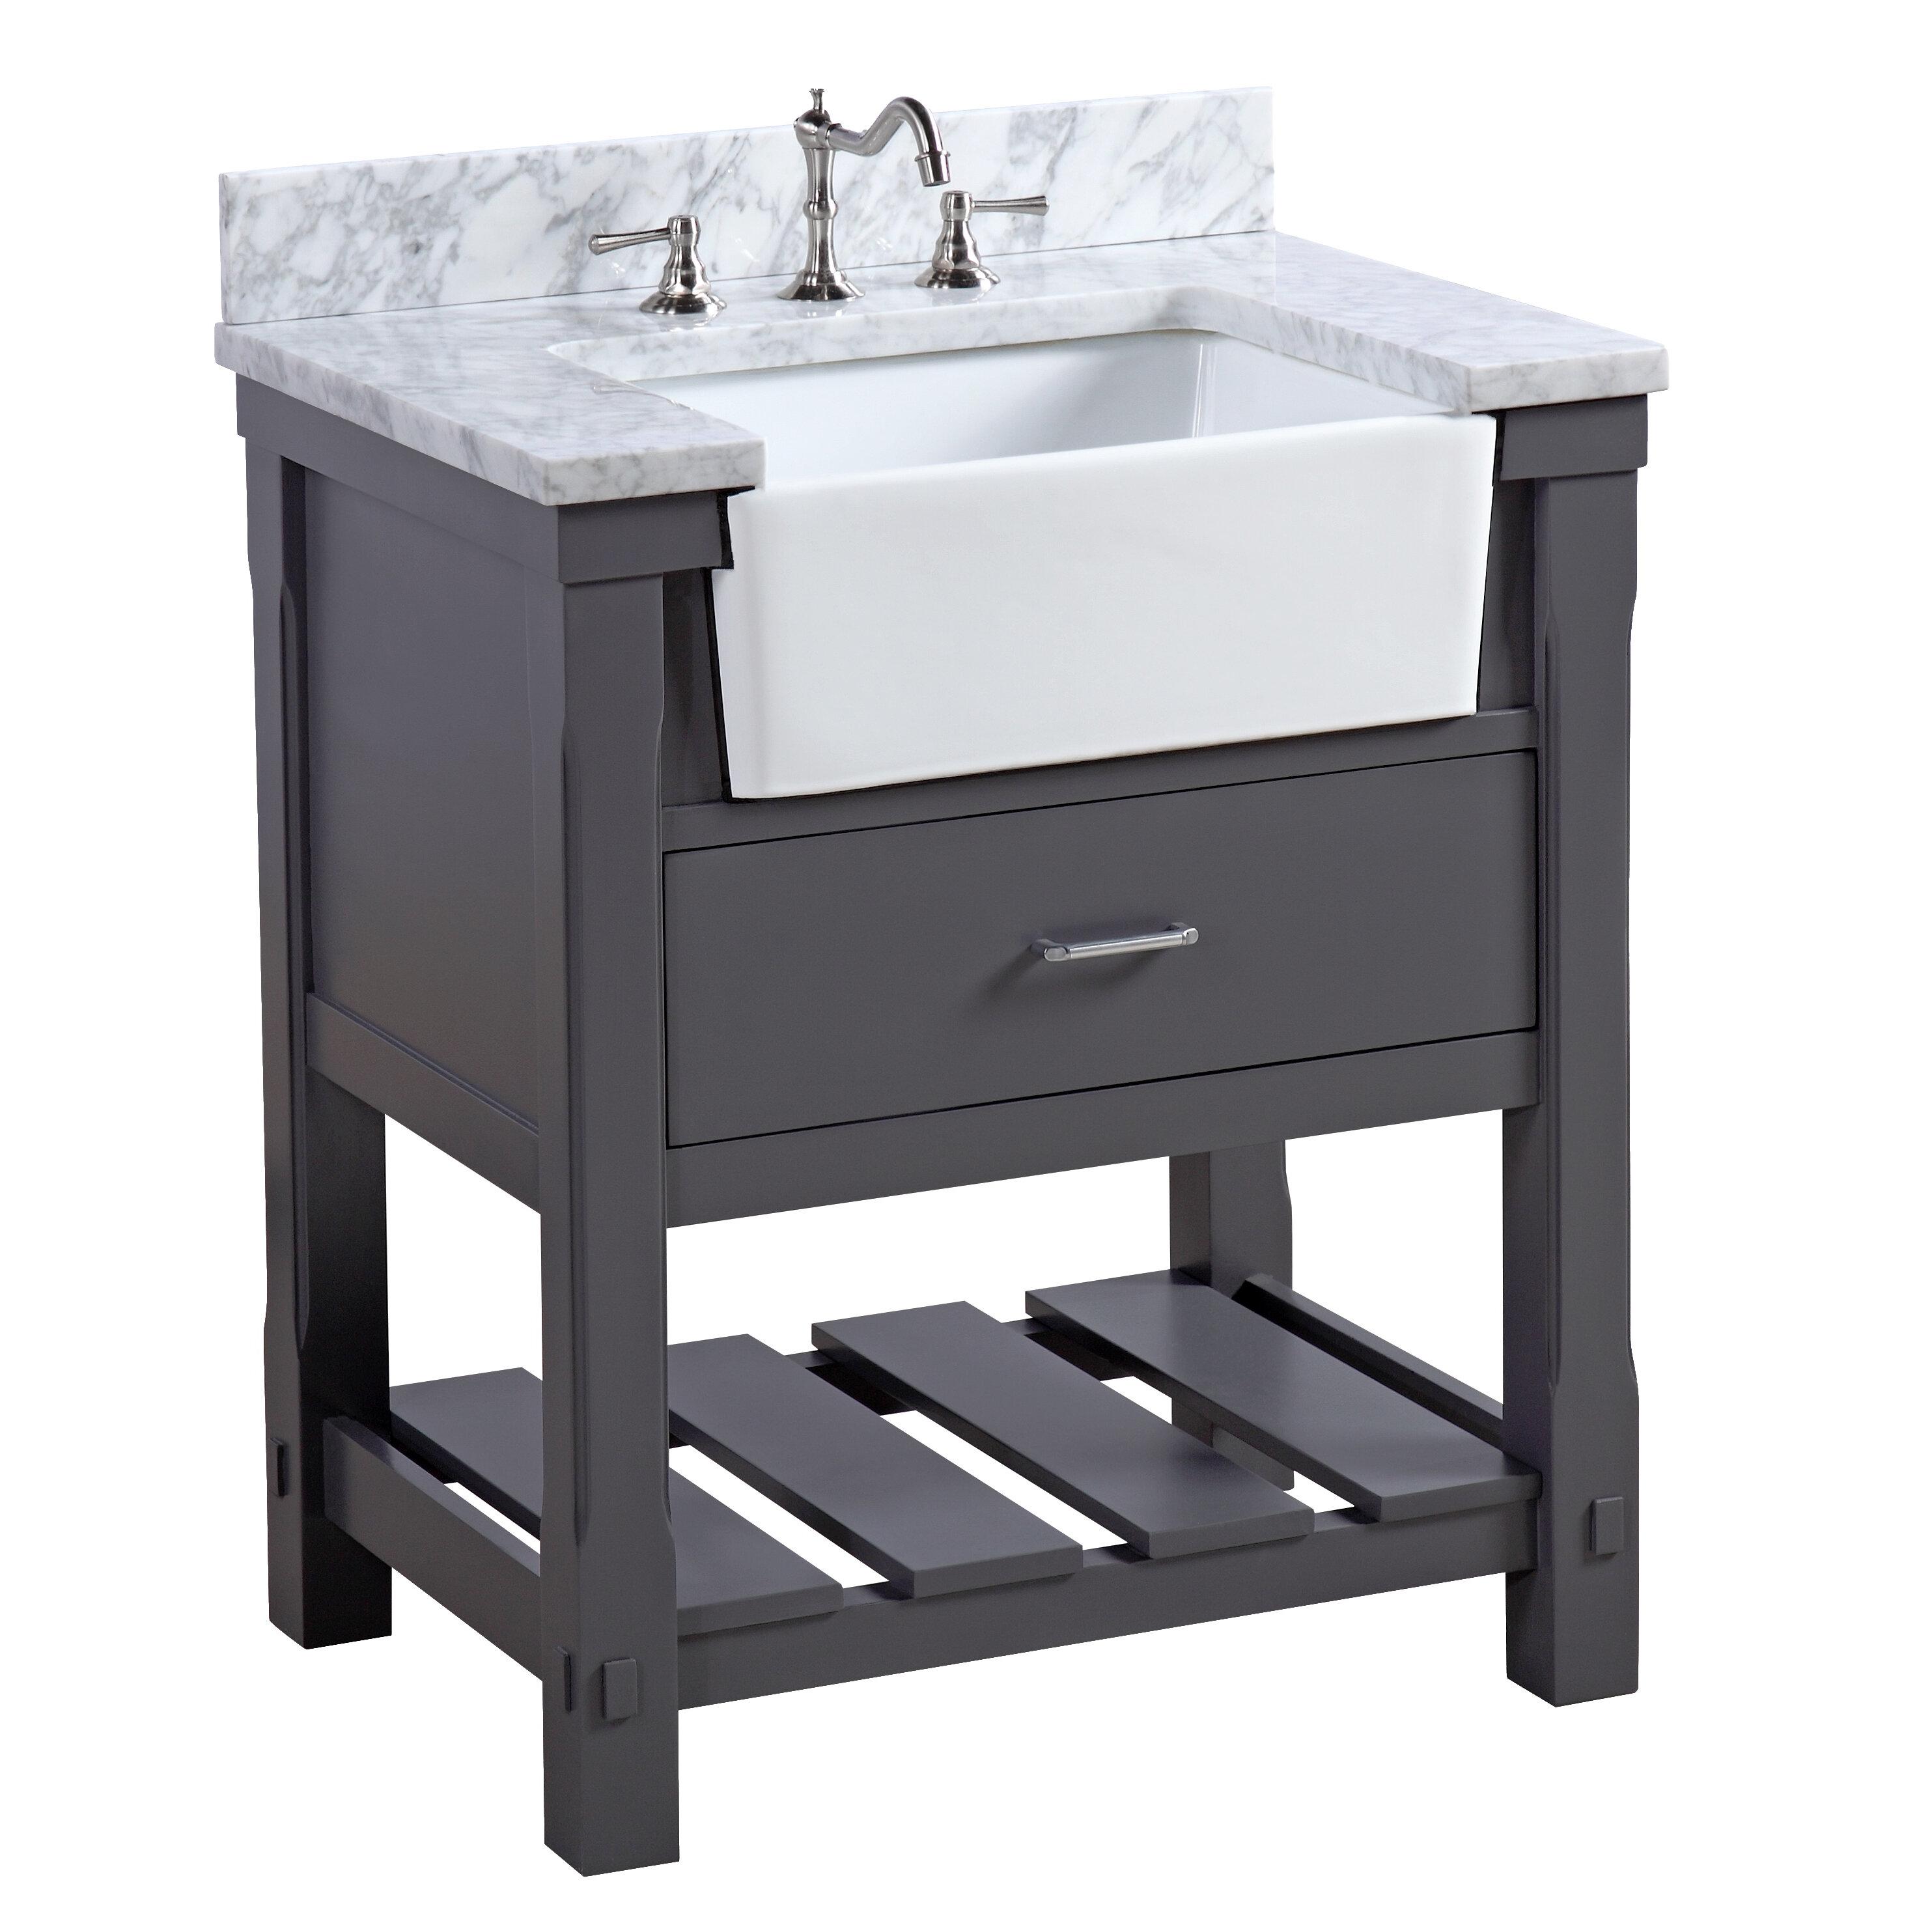 Wayfair Farmhouse Bathroom Vanities You Ll Love In 2021